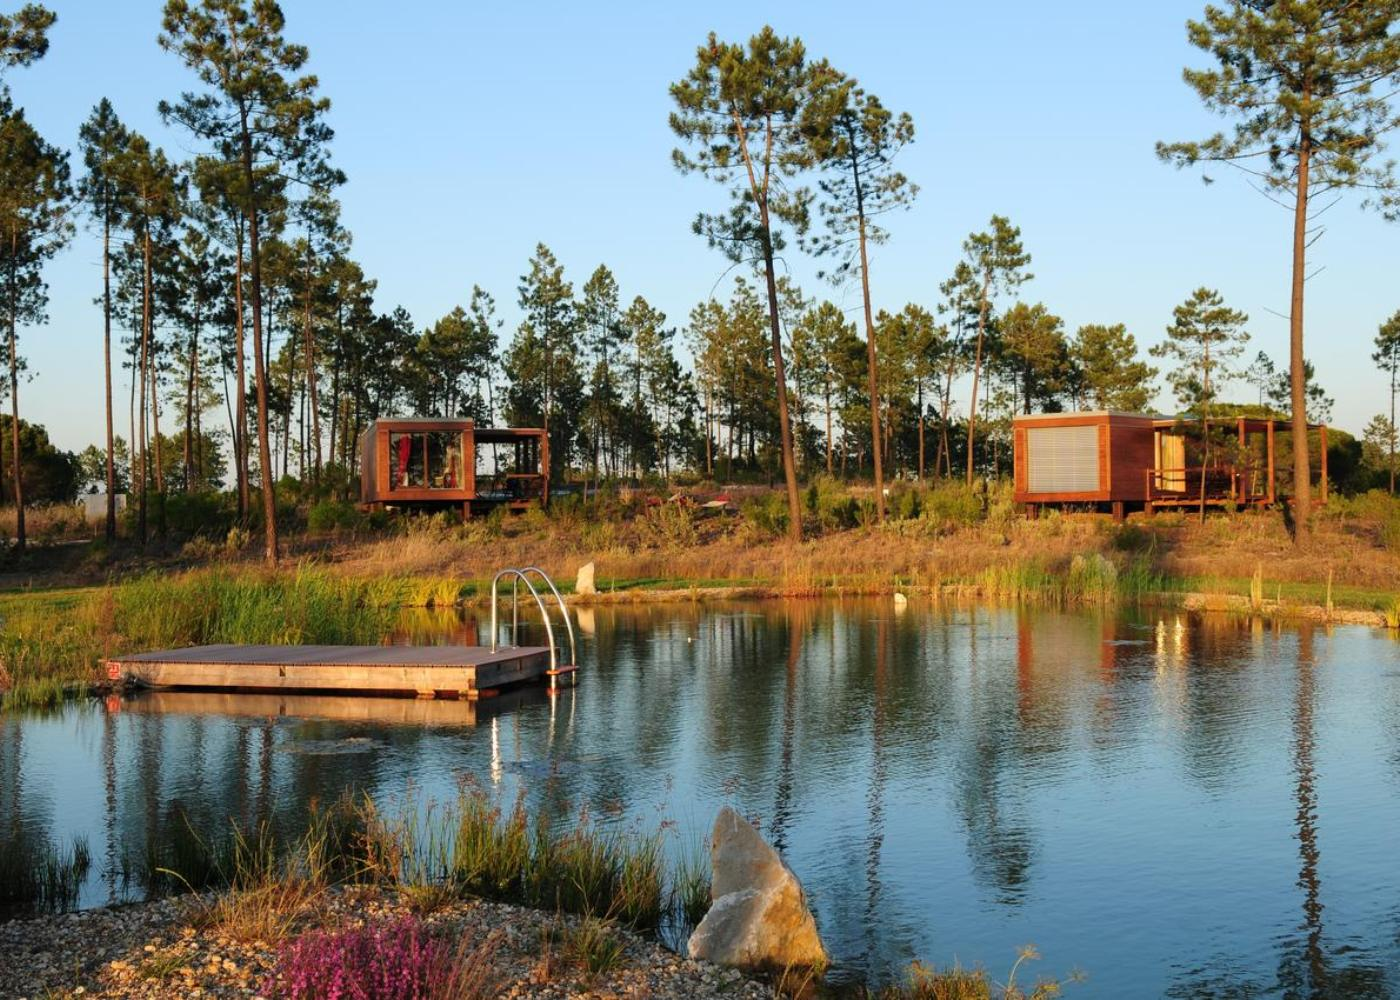 Cocoon Lodges Comporta Eco-resort